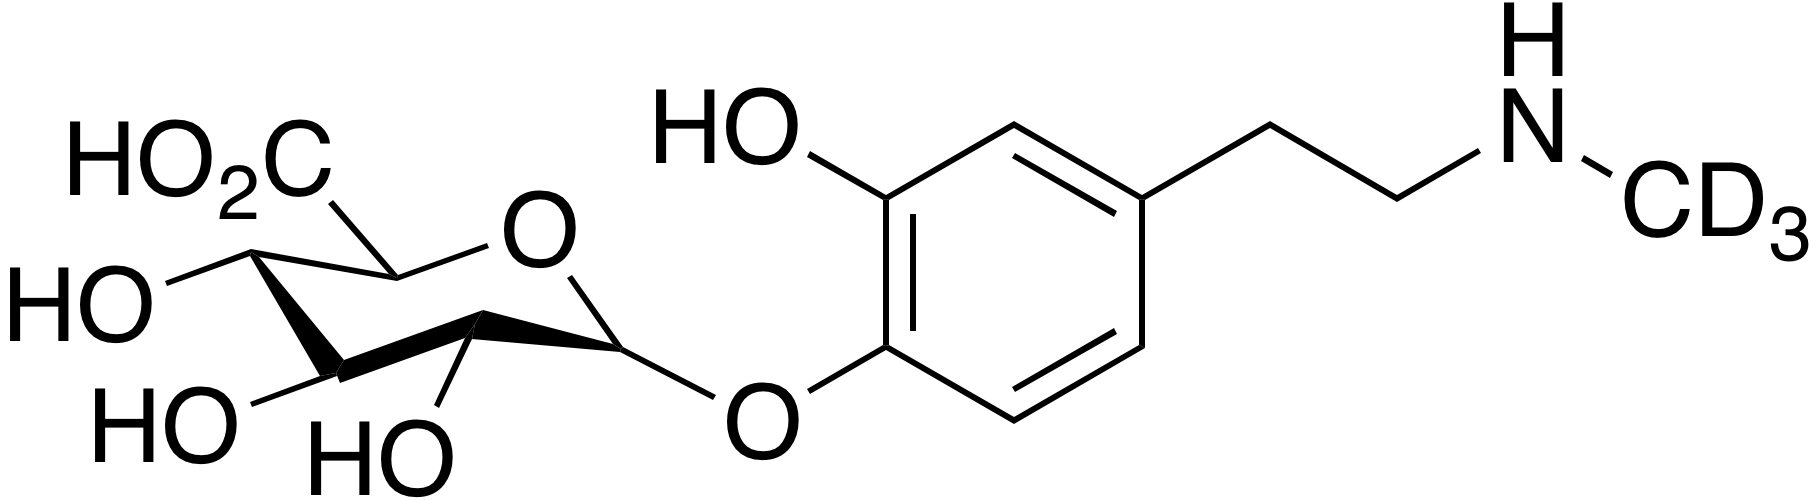 4-O-Glucuronylepinine-d<sub>3</sub>